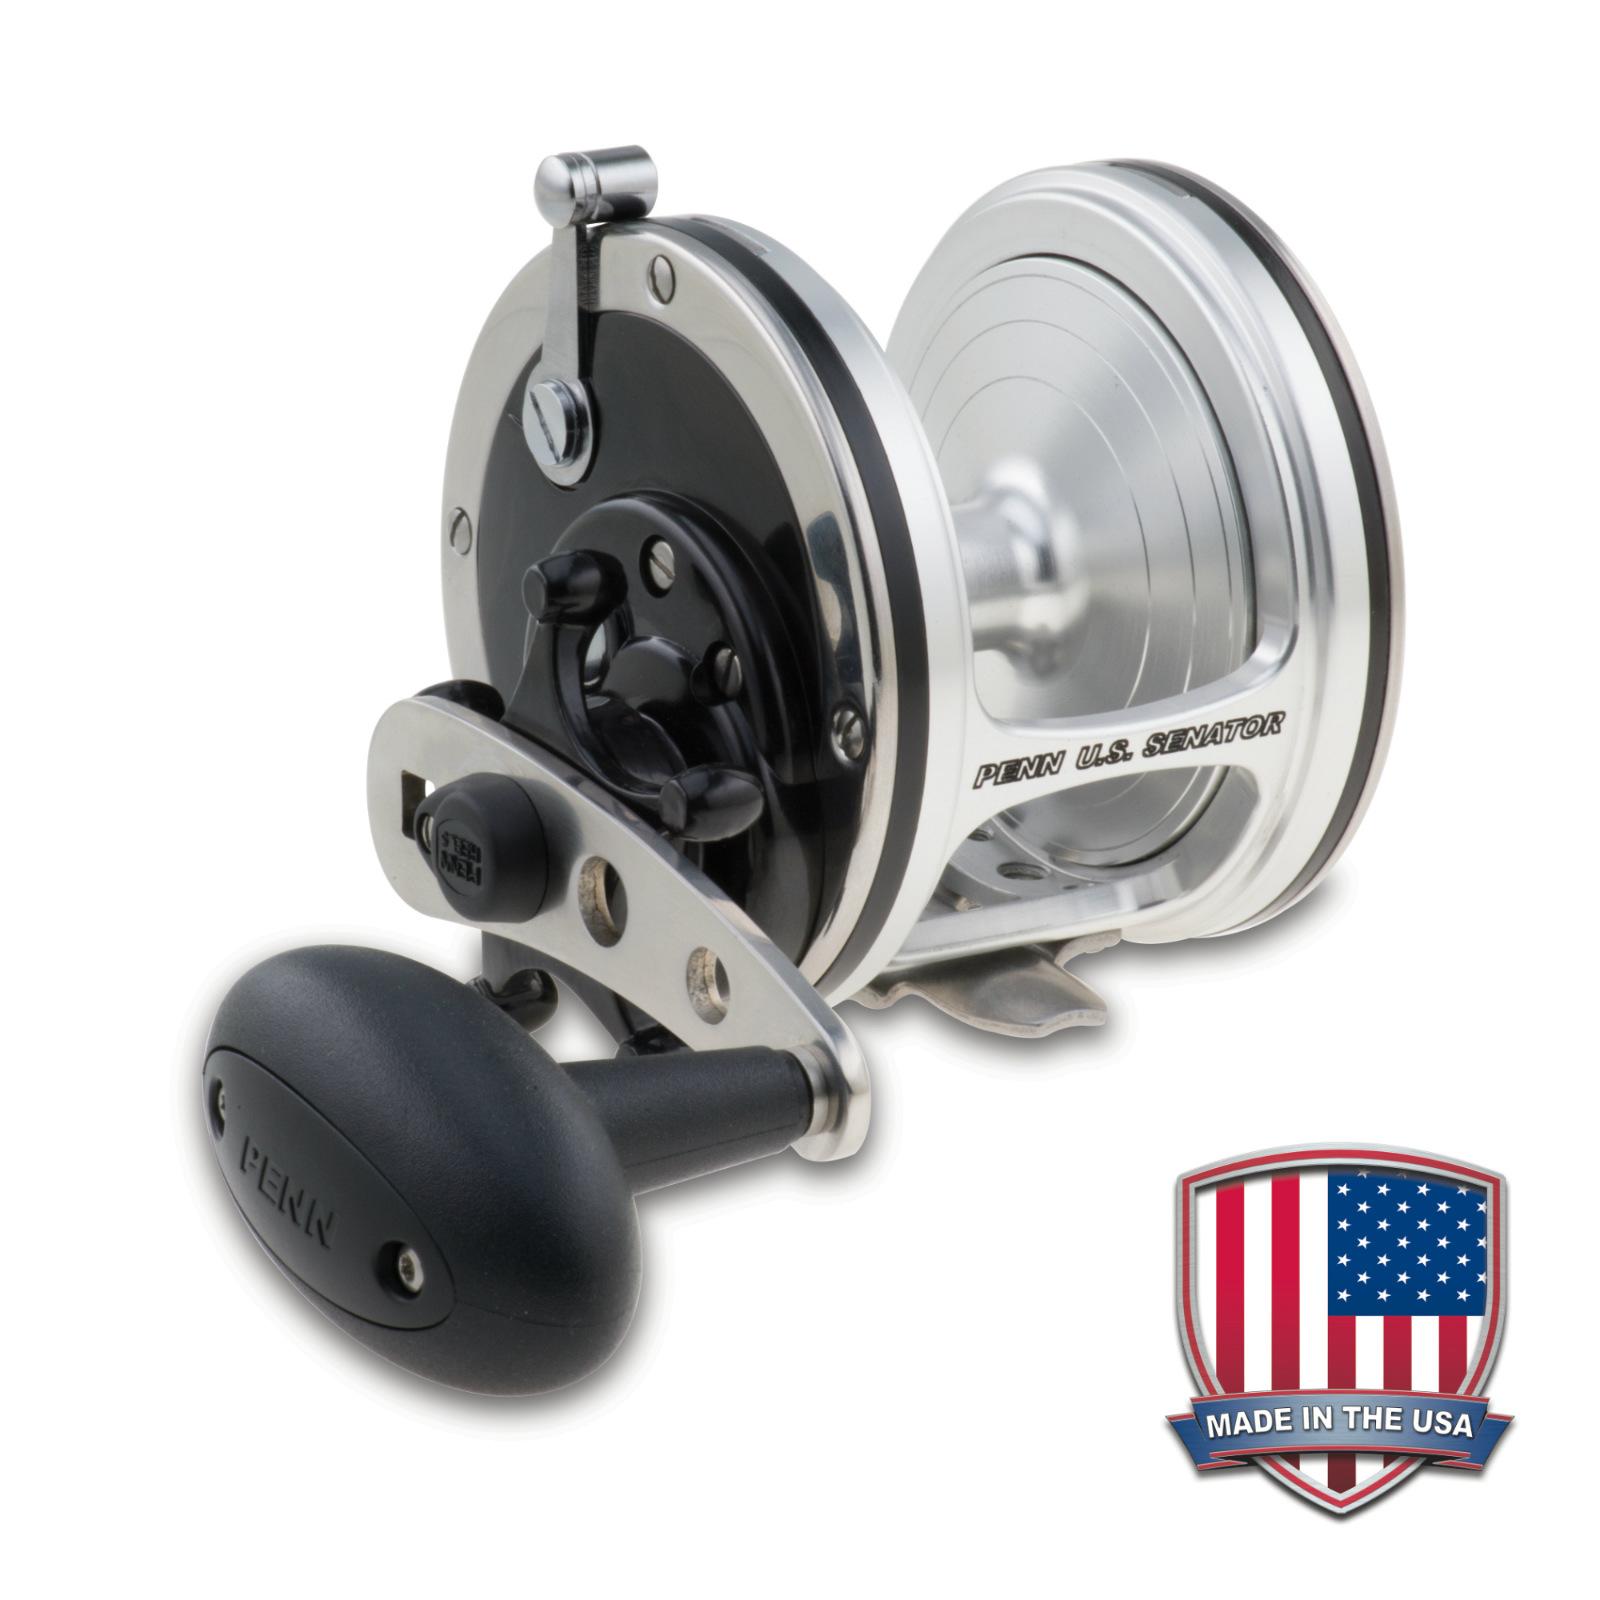 Penn us senator 113n fishing reel free usa shipping new for Fishing reels made in usa